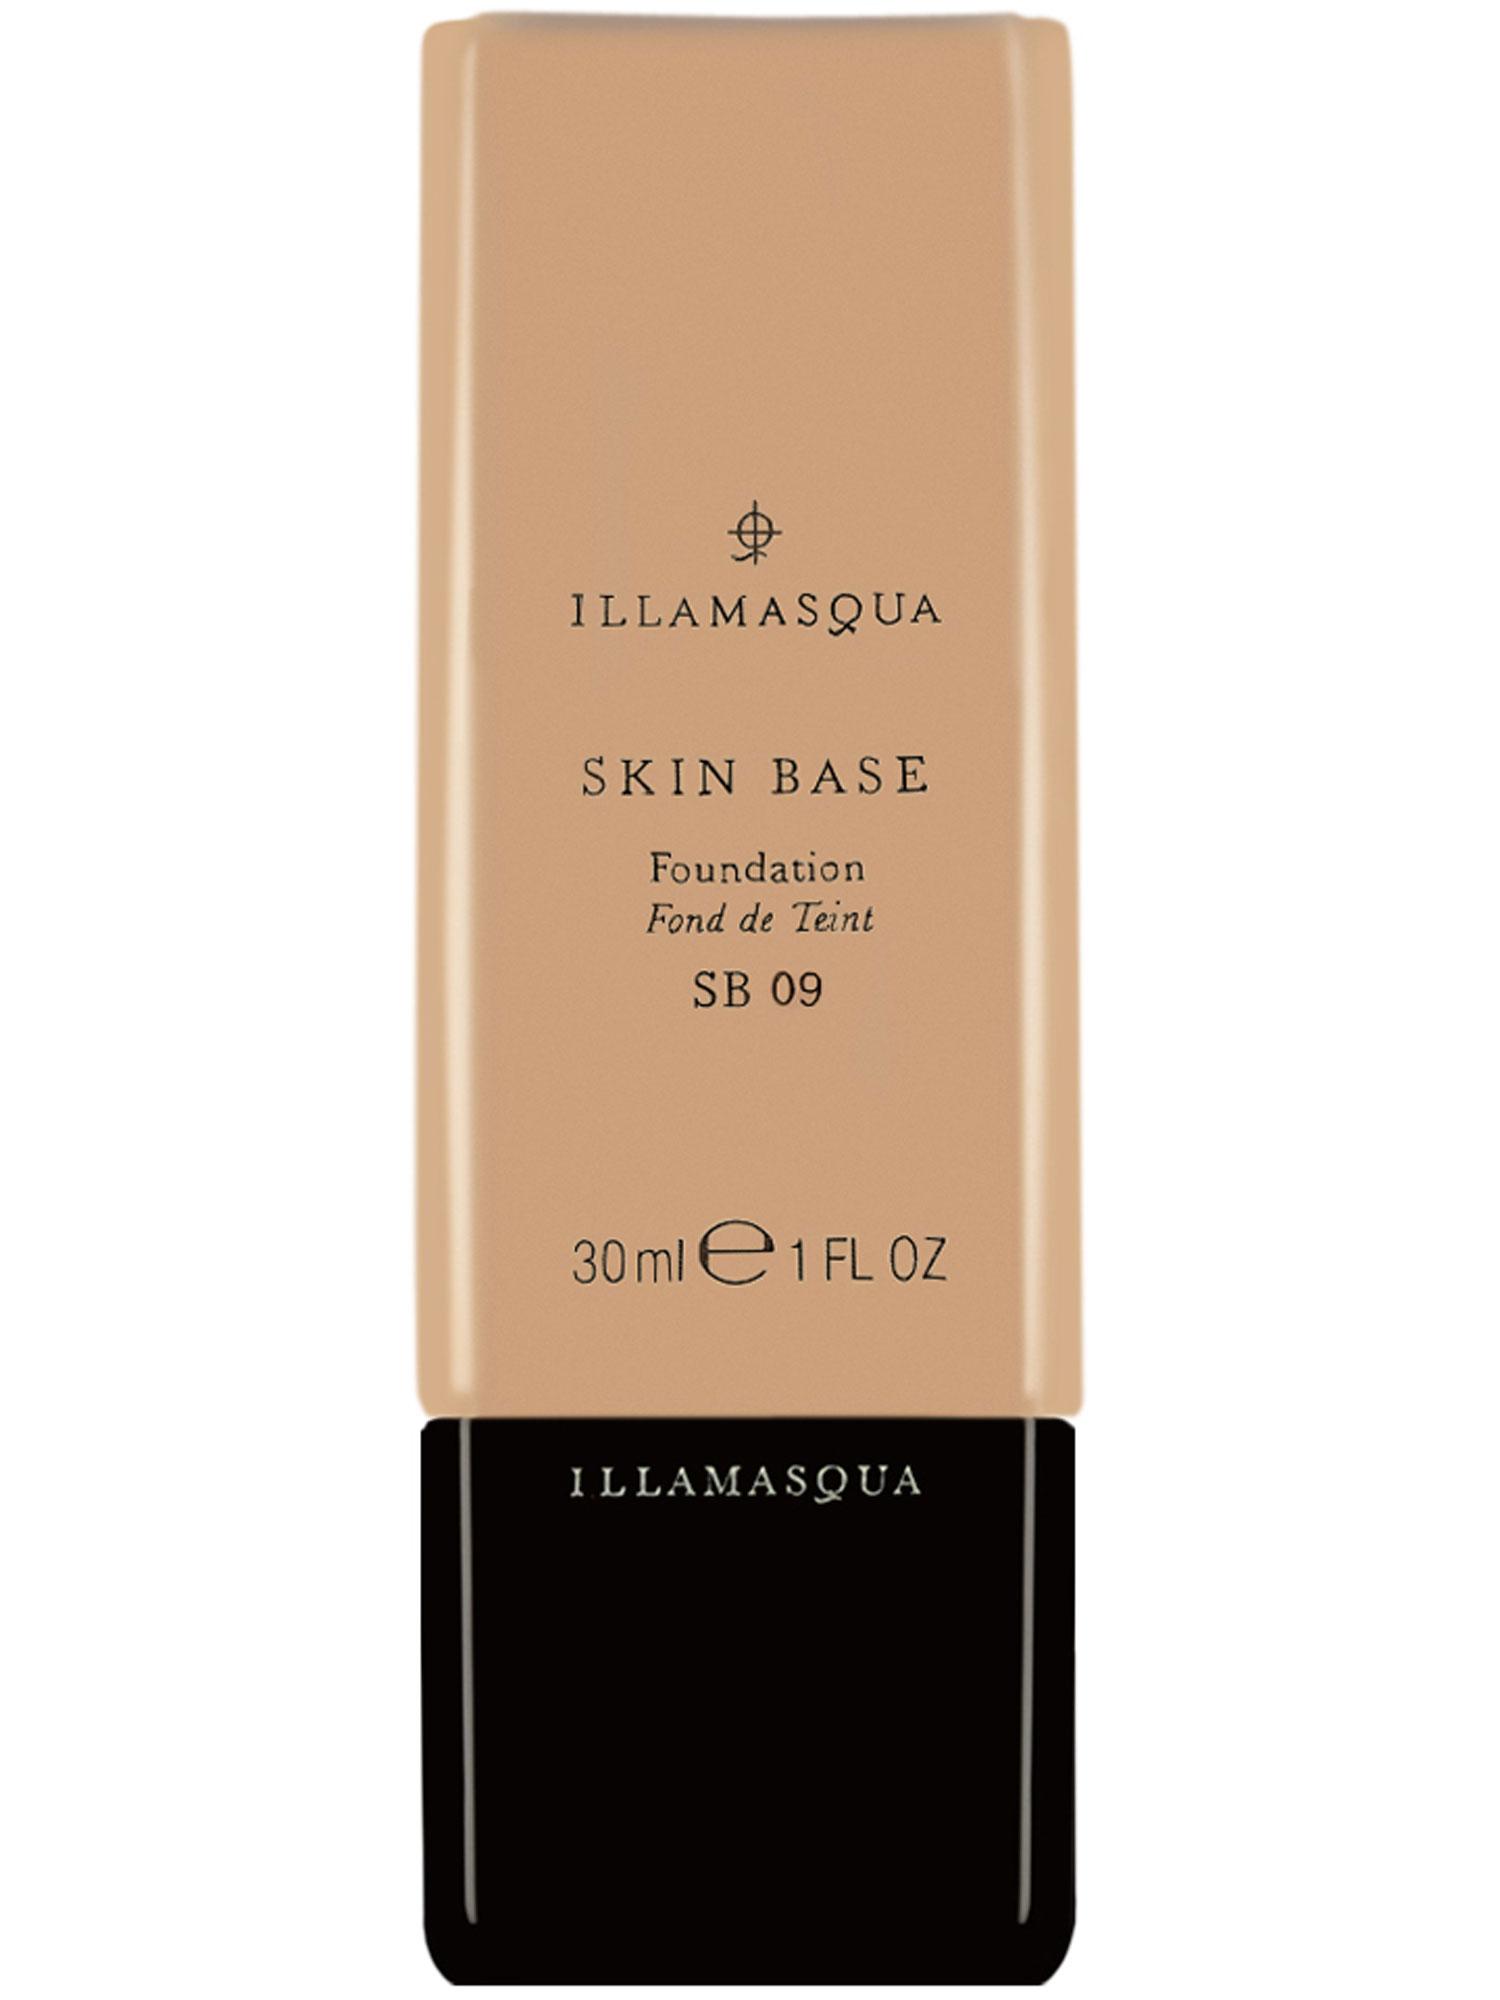 ILLAMASQUA-Skin-Base-Foundation-30-ml-1-FL-OZ-43-NEW thumbnail 11